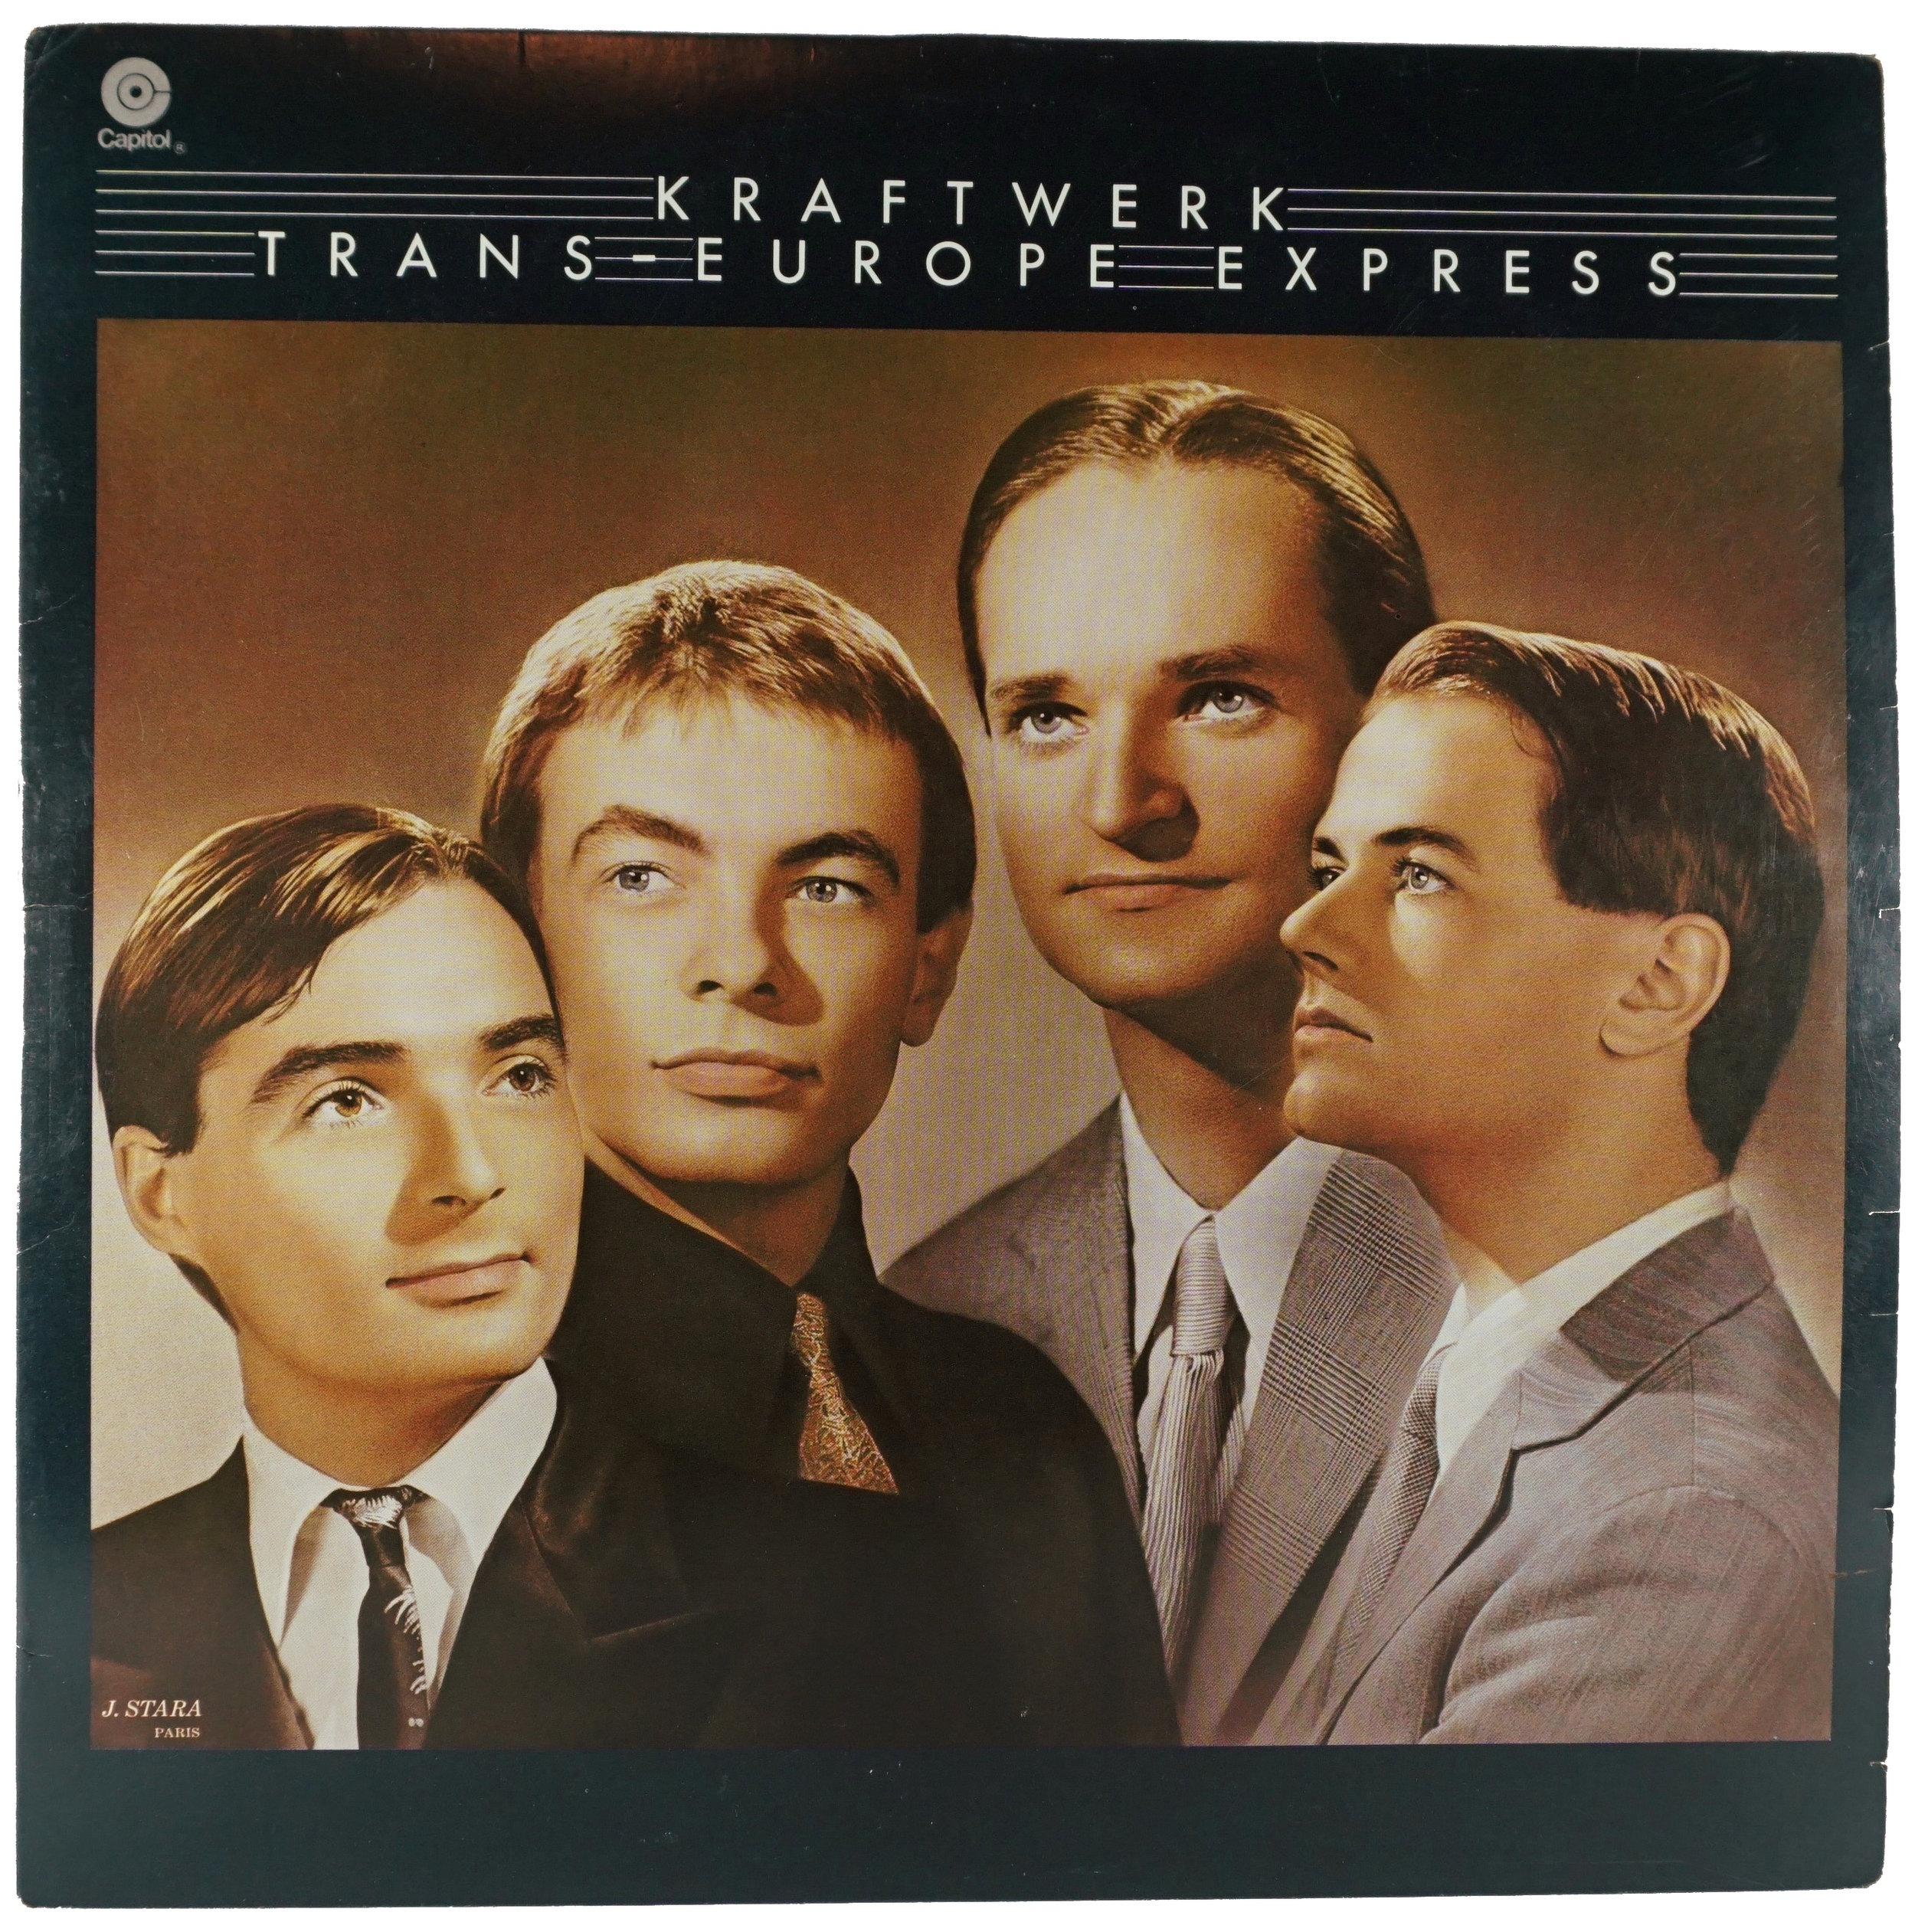 WLWLTDOO-1977-LP-KRAFTWERK-TRANS-FRONT-SW11603.jpg